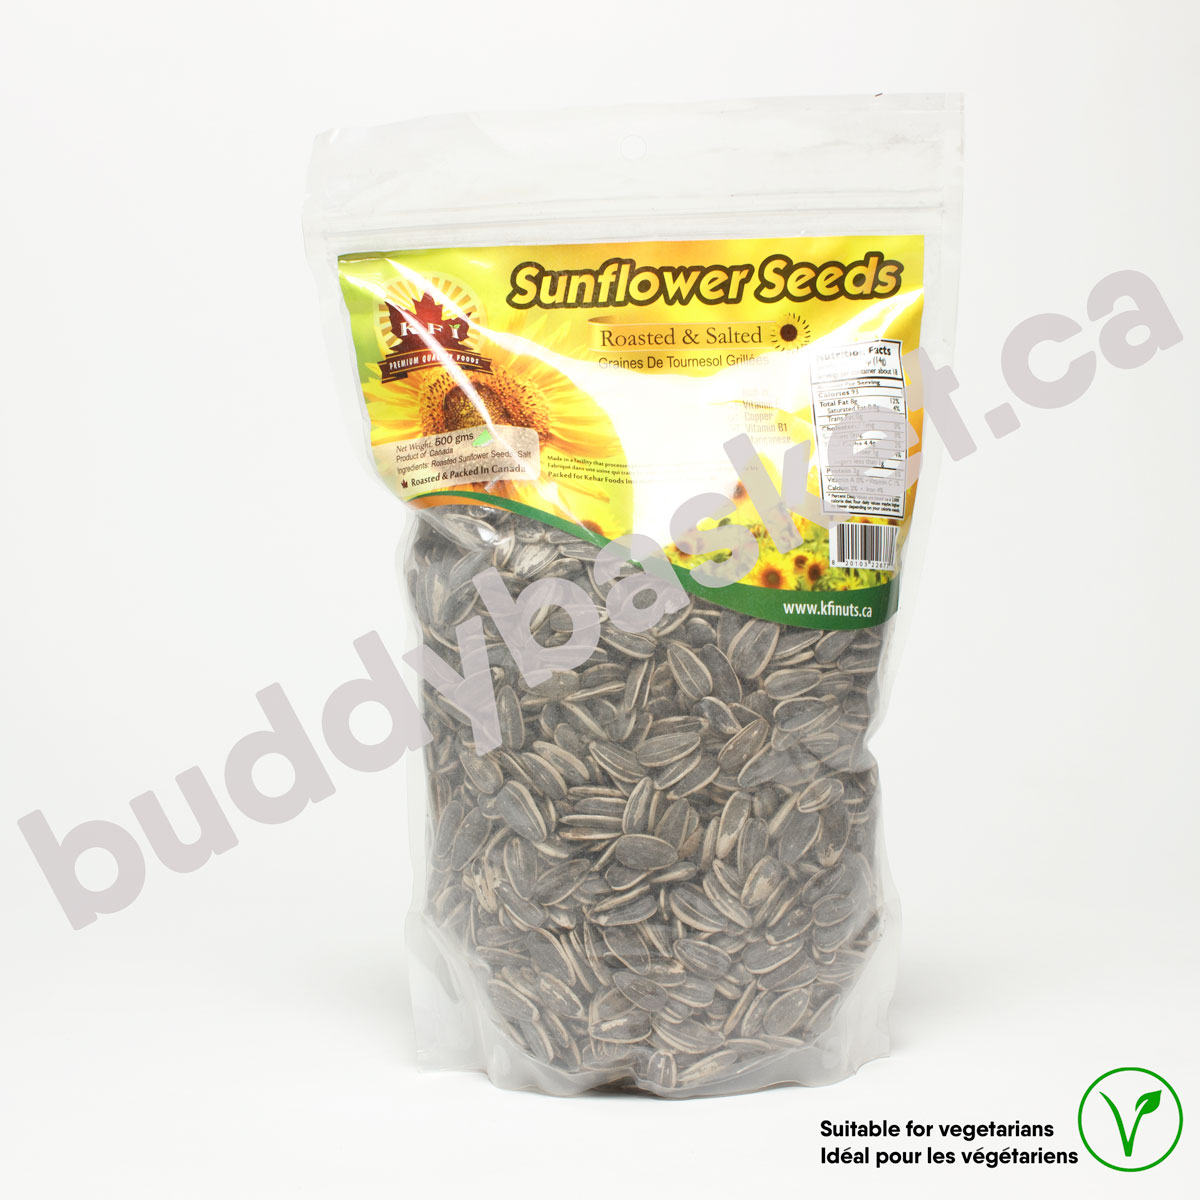 KFI Sunflower Seed HulRaw 300g